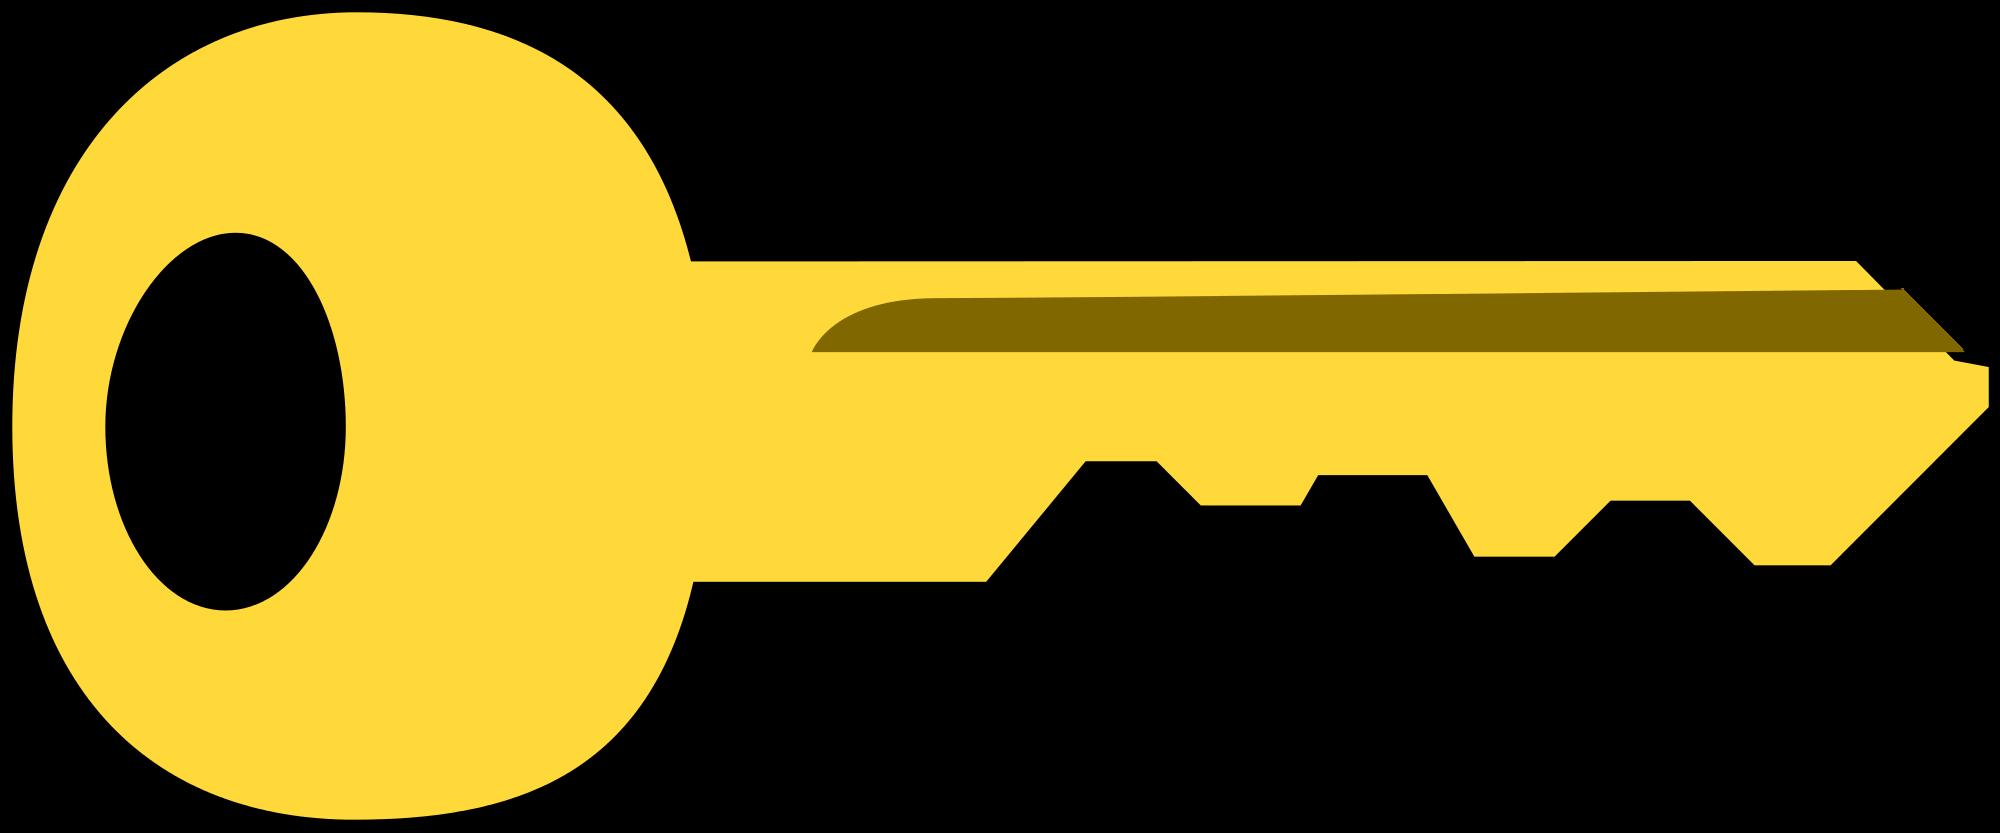 Key svg #476, Download drawings